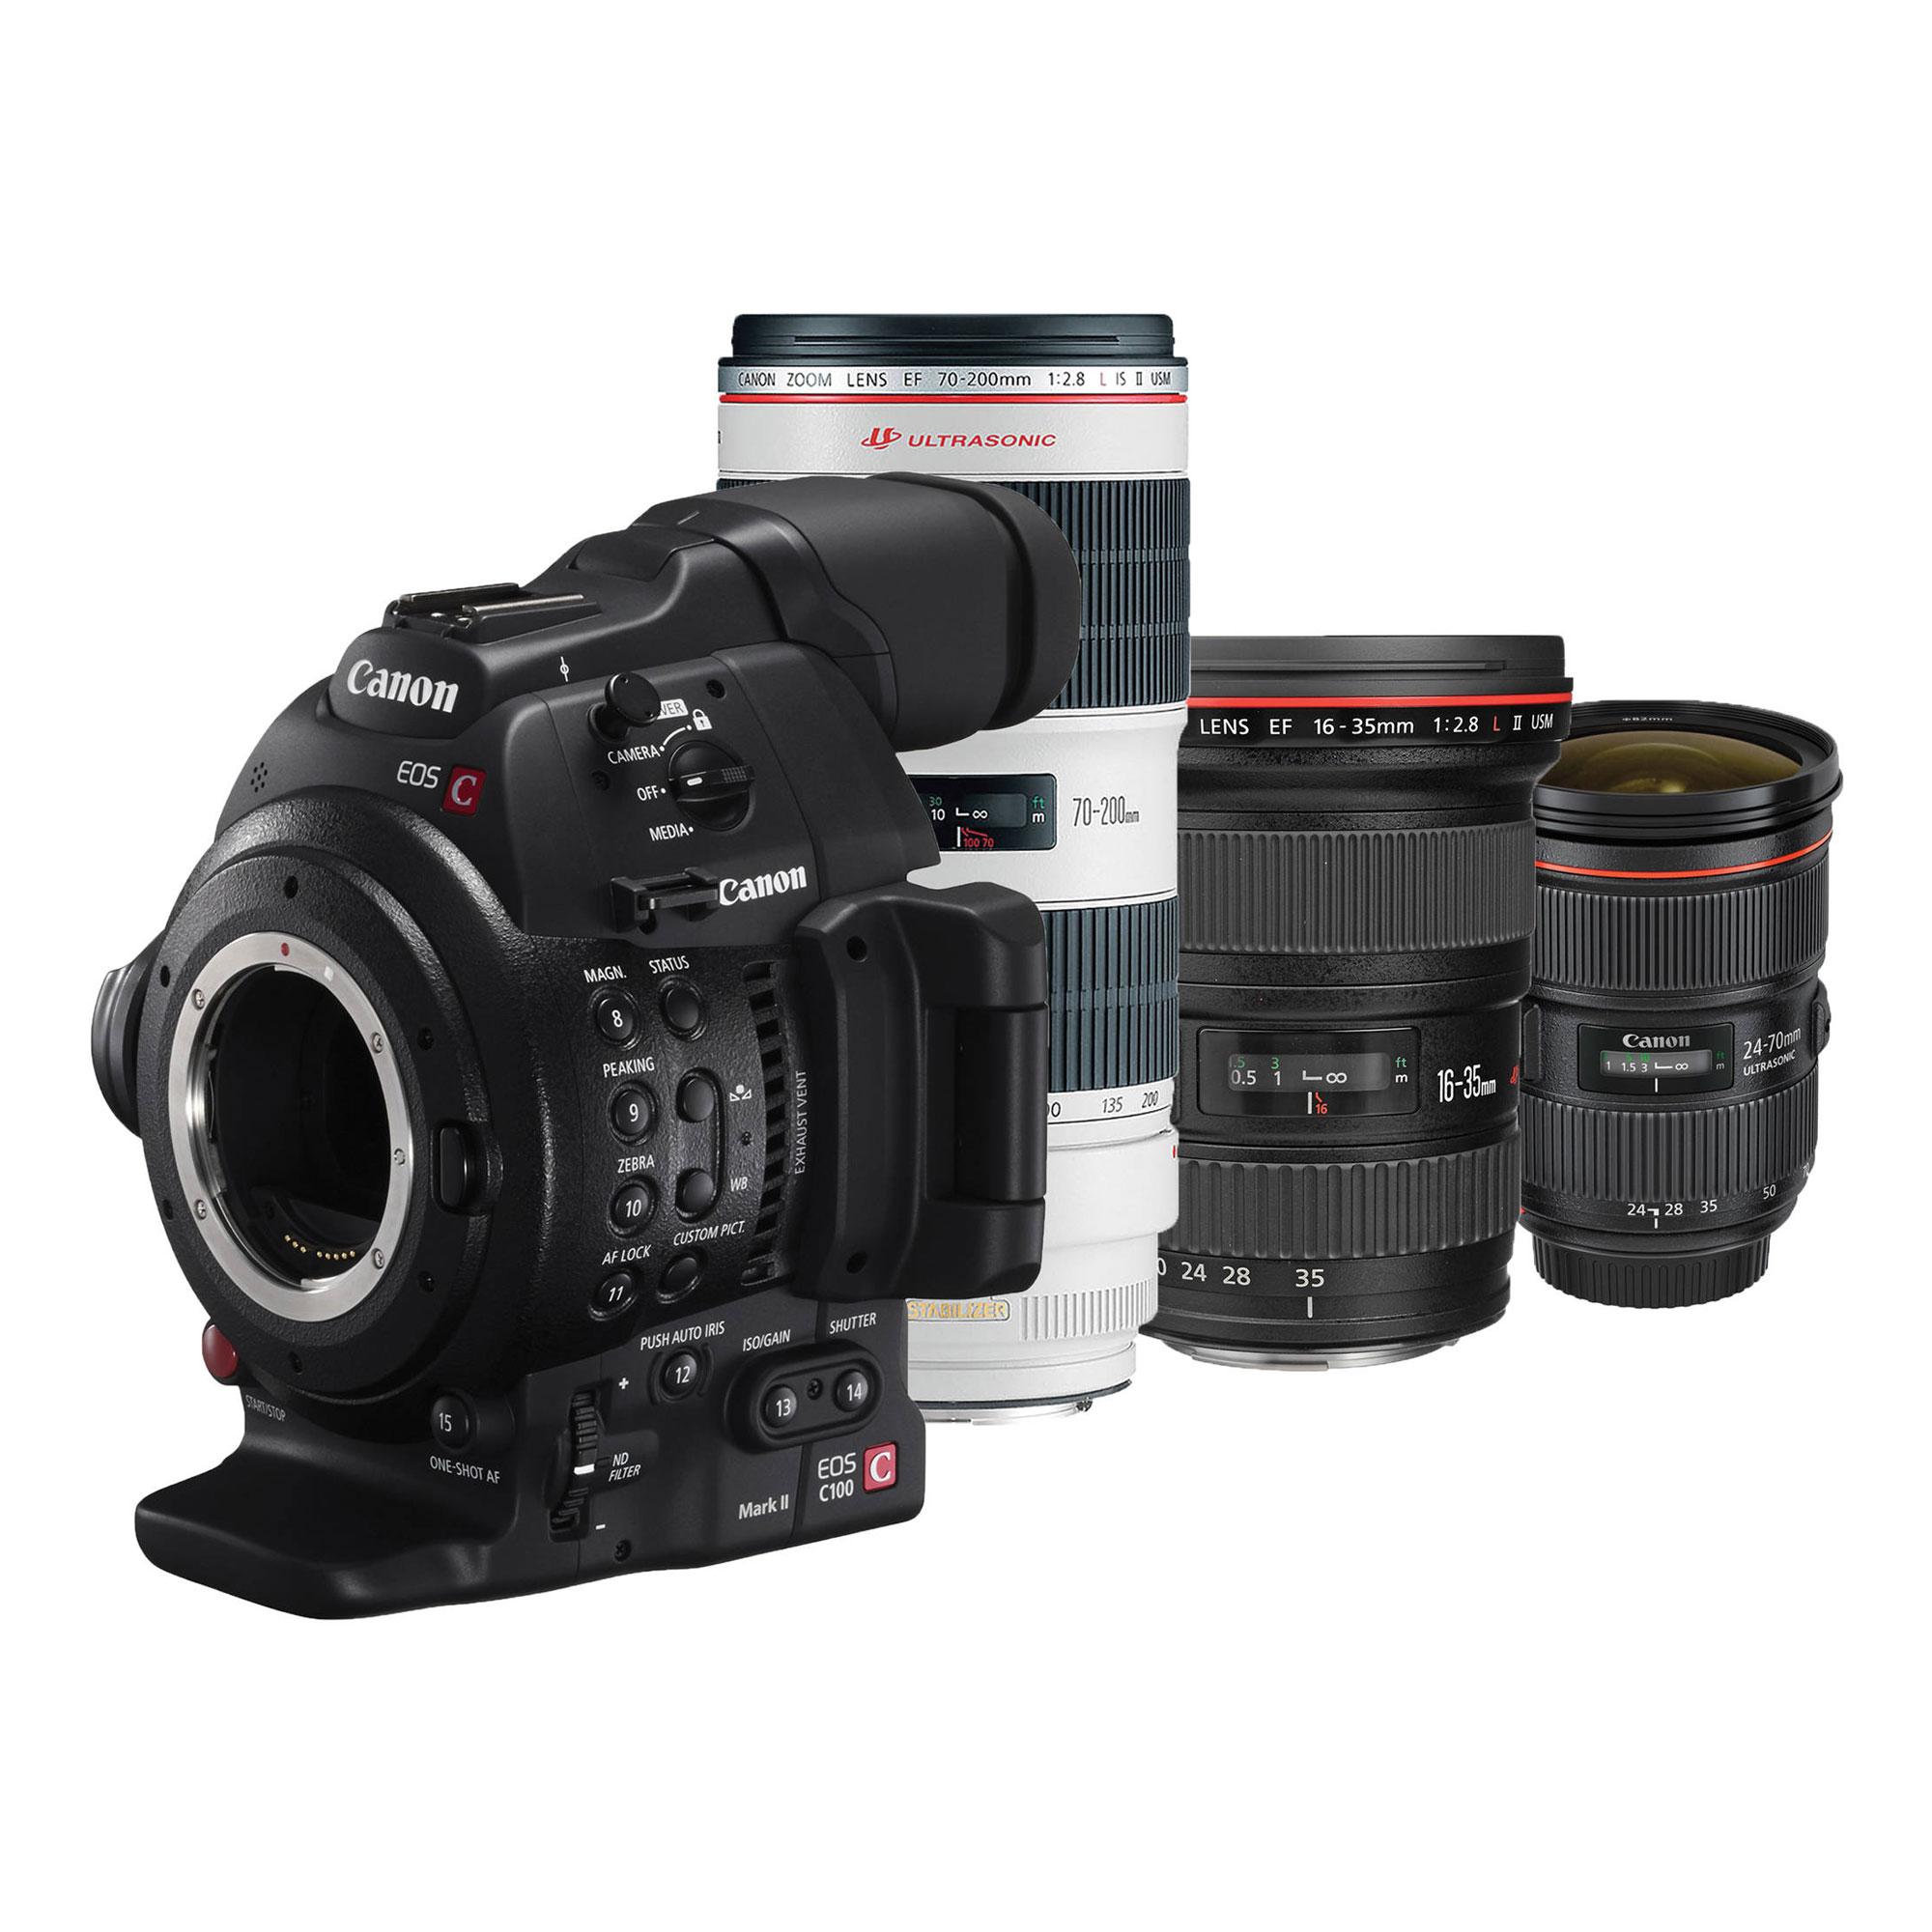 Canon | EOS C100 Mark II Cinema EOS Camera with Triple Lens Kit